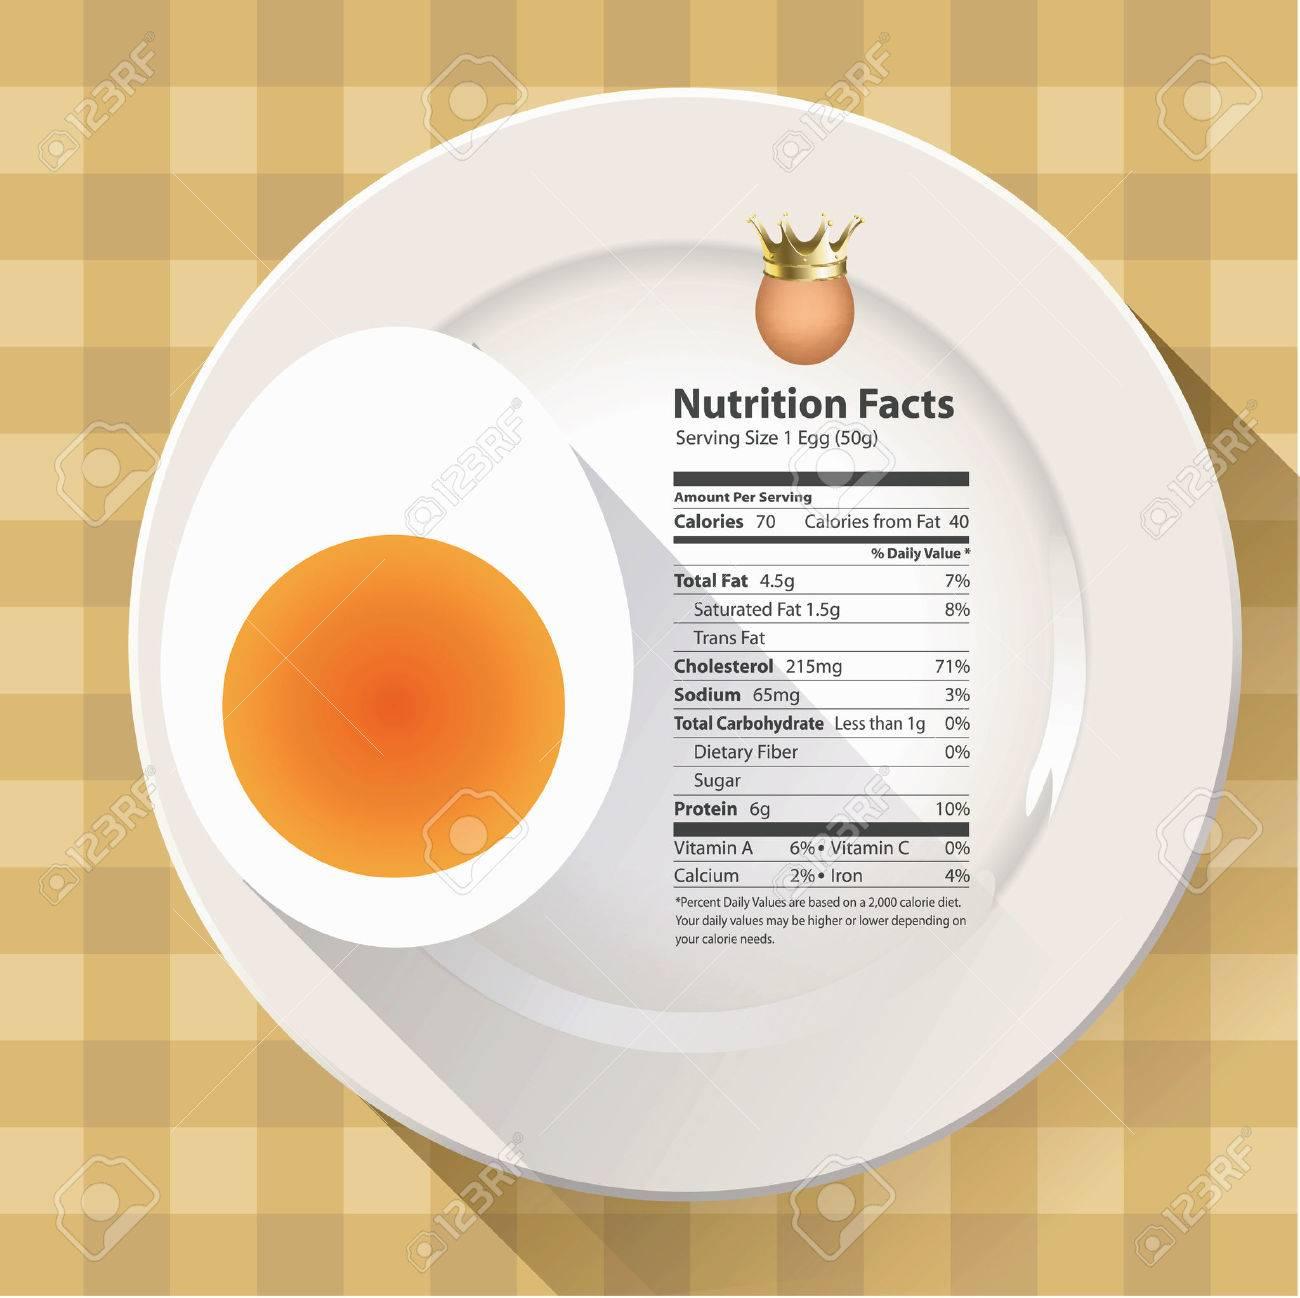 Popular Stockfoto Vector Bacon Nutrition Facts Egg Vector Nutrition Facts Egg V Rer Och Calories Fried Egg